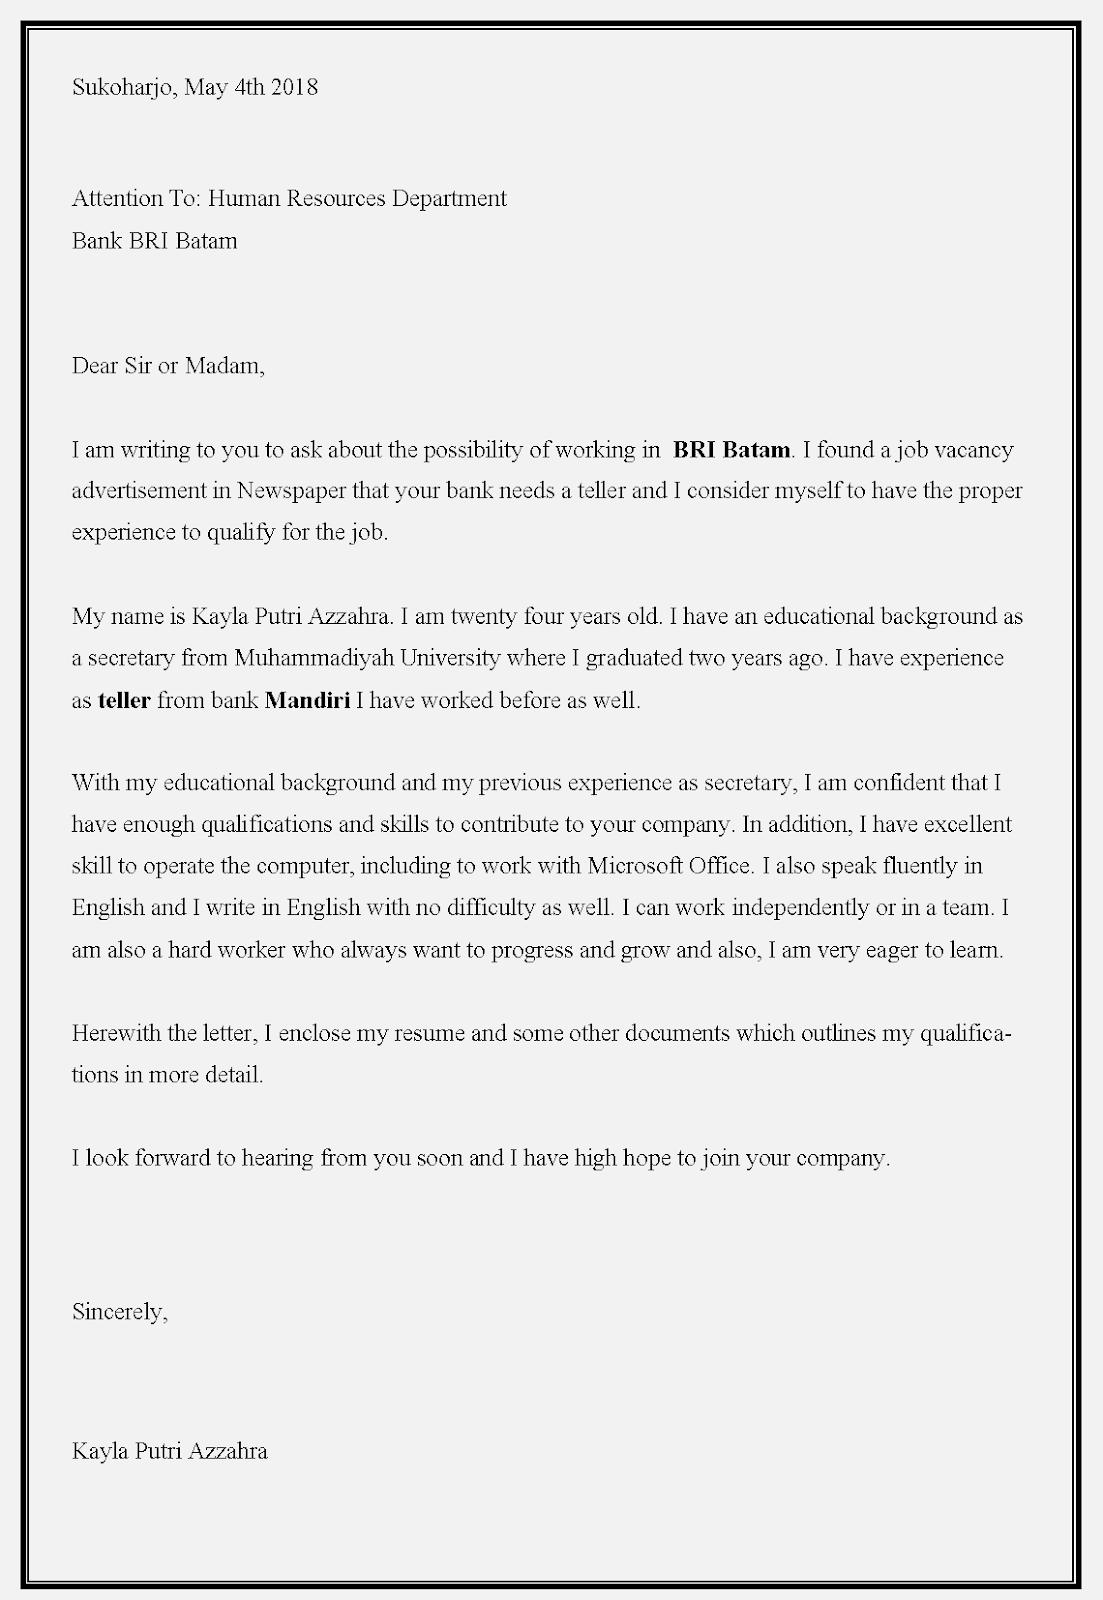 Contoh surat lamaran kerja Bank BRI dalam bahasa Inggris